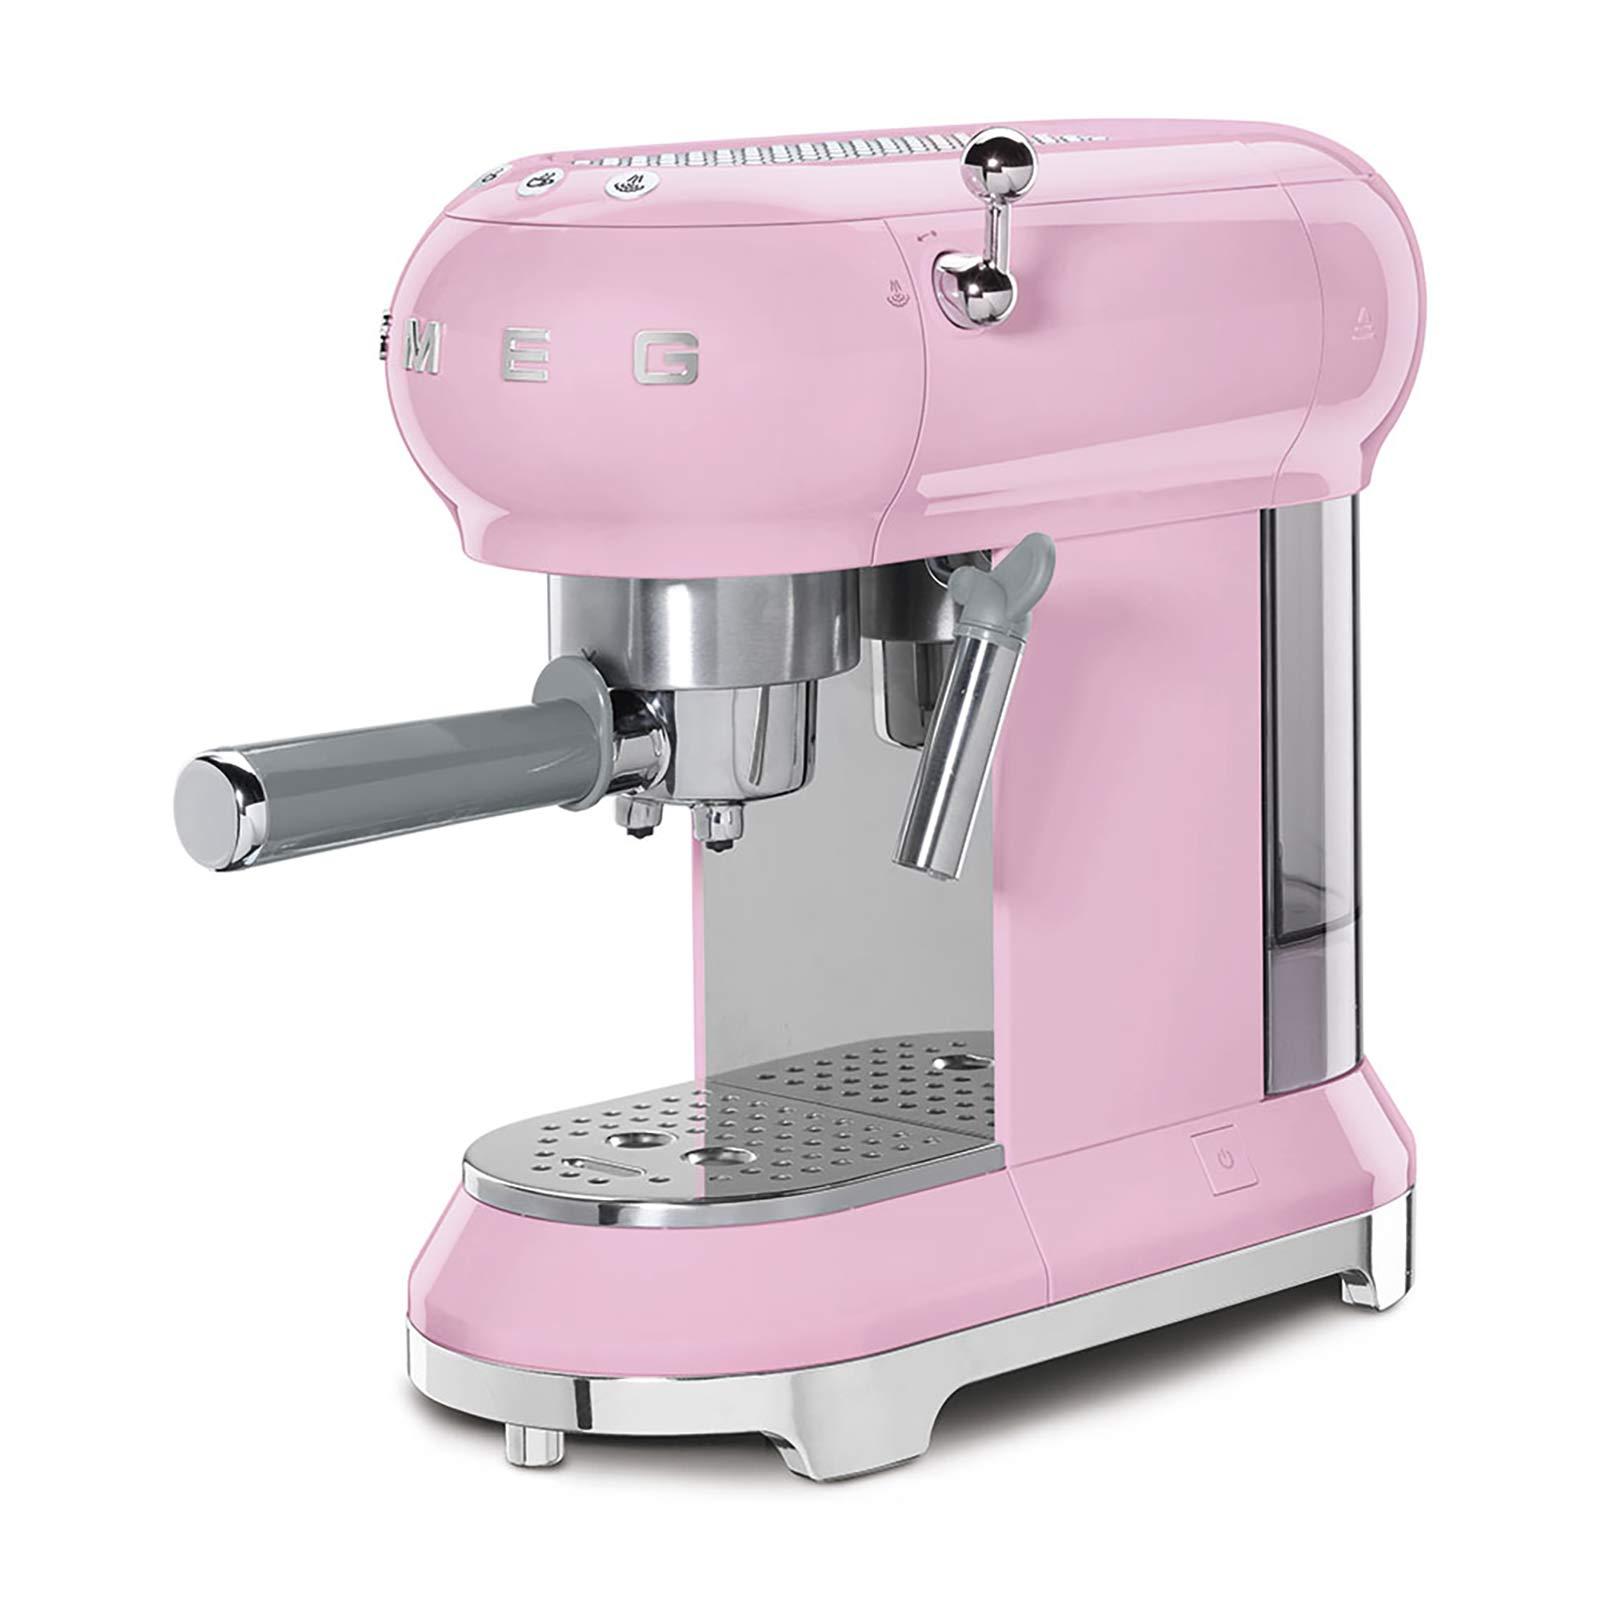 Smeg Espresso Kahve Makinesi Pink